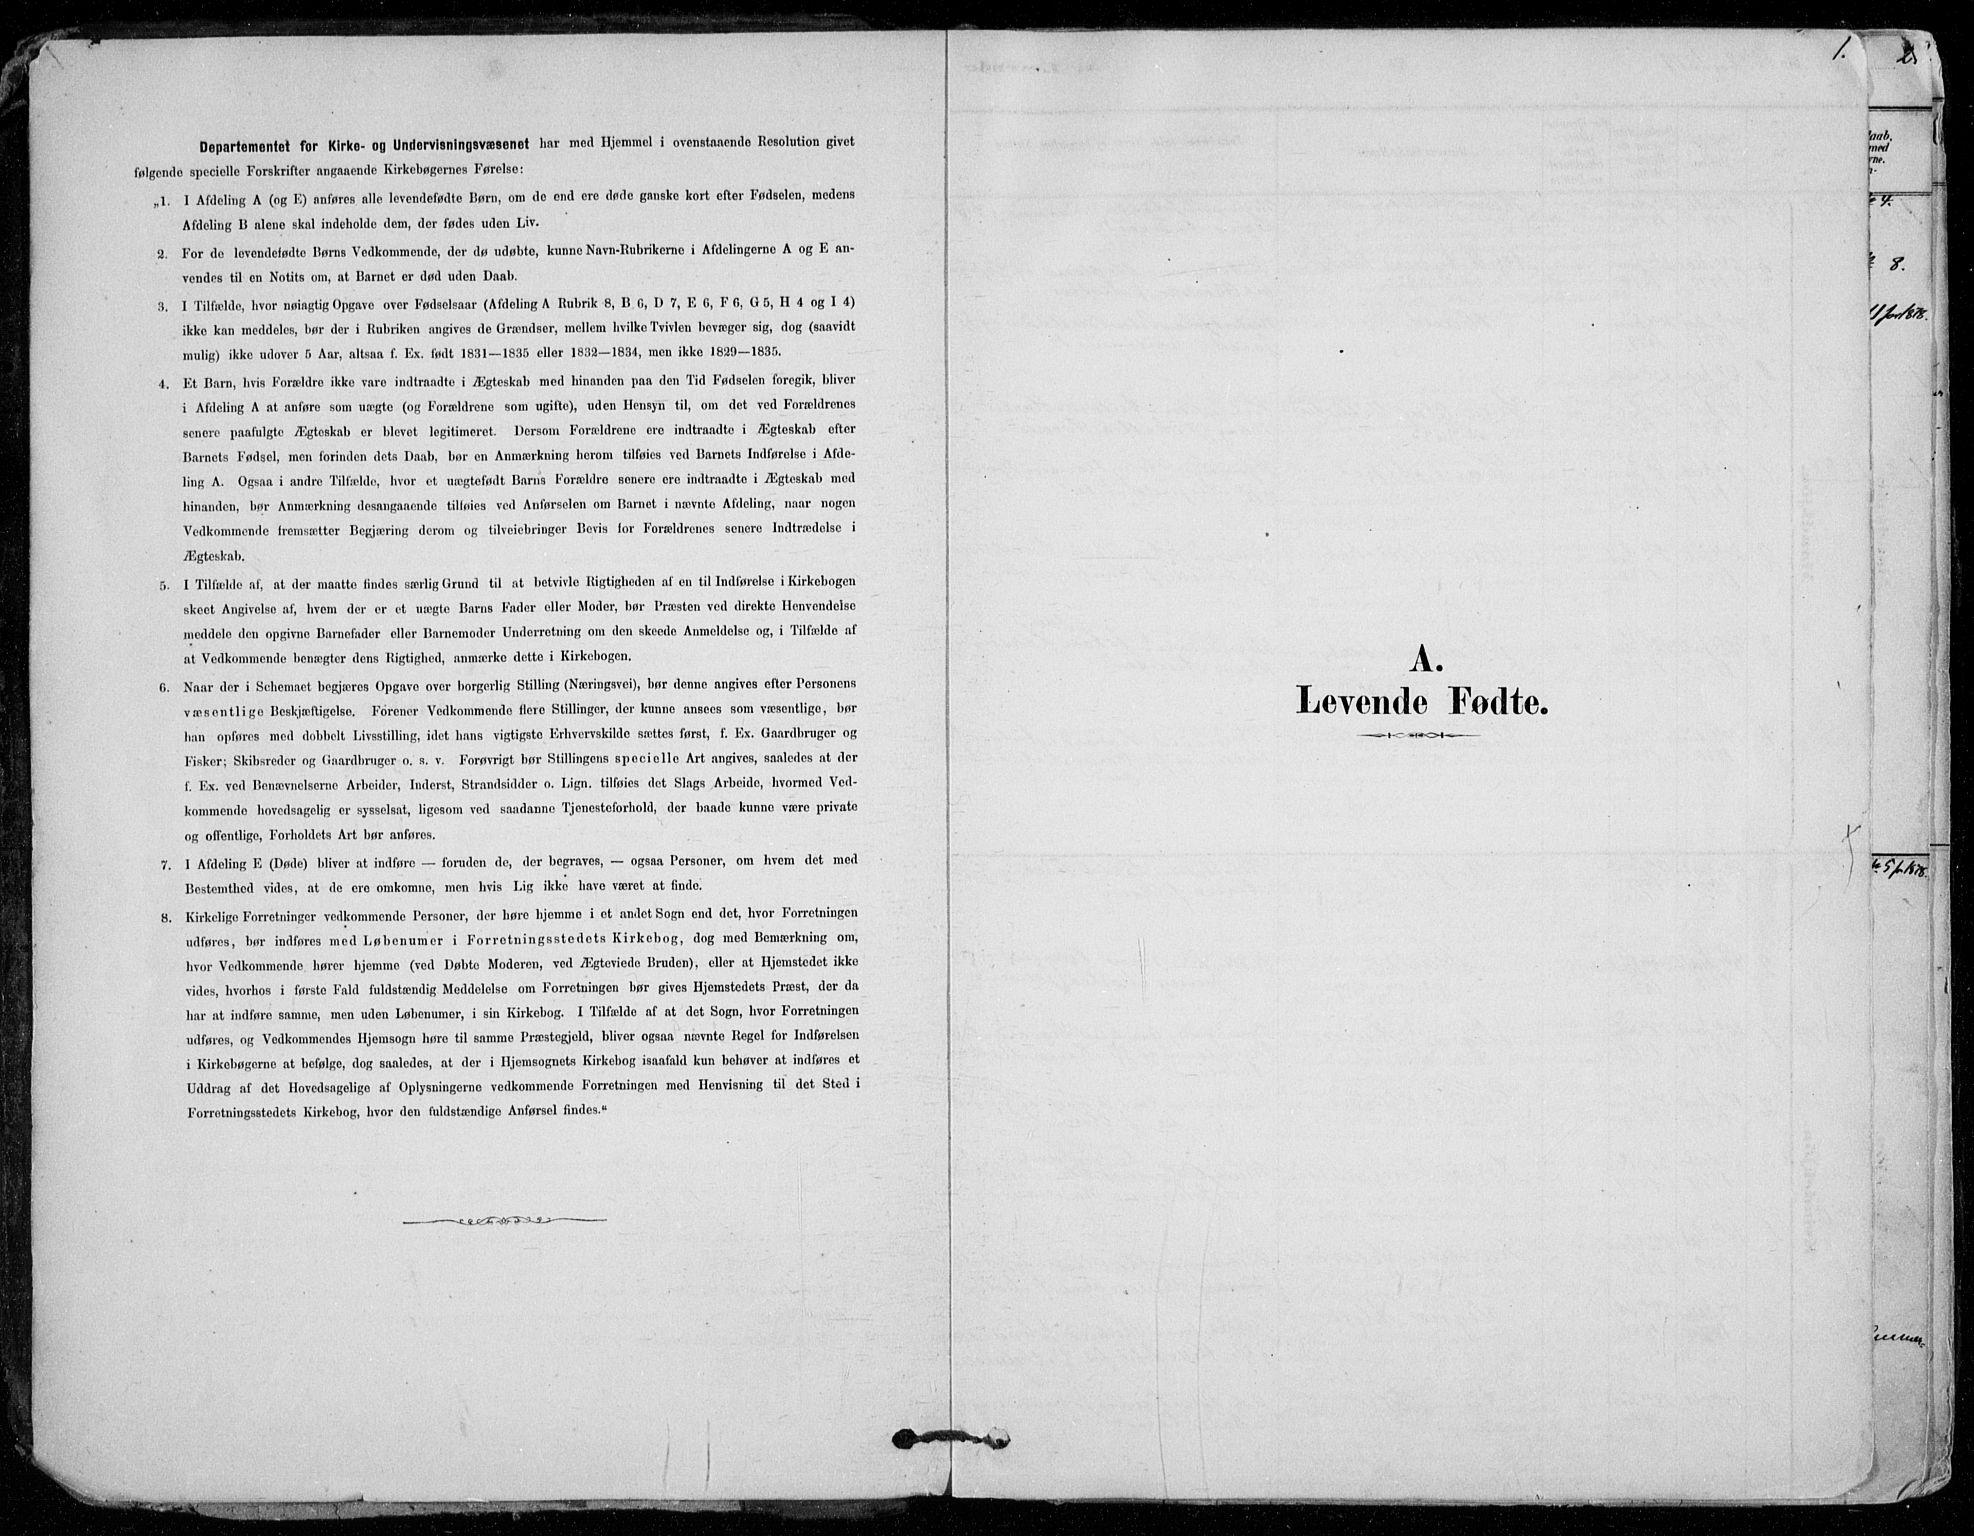 SAO, Vestby prestekontor Kirkebøker, F/Fd/L0001: Ministerialbok nr. IV 1, 1878-1945, s. 1